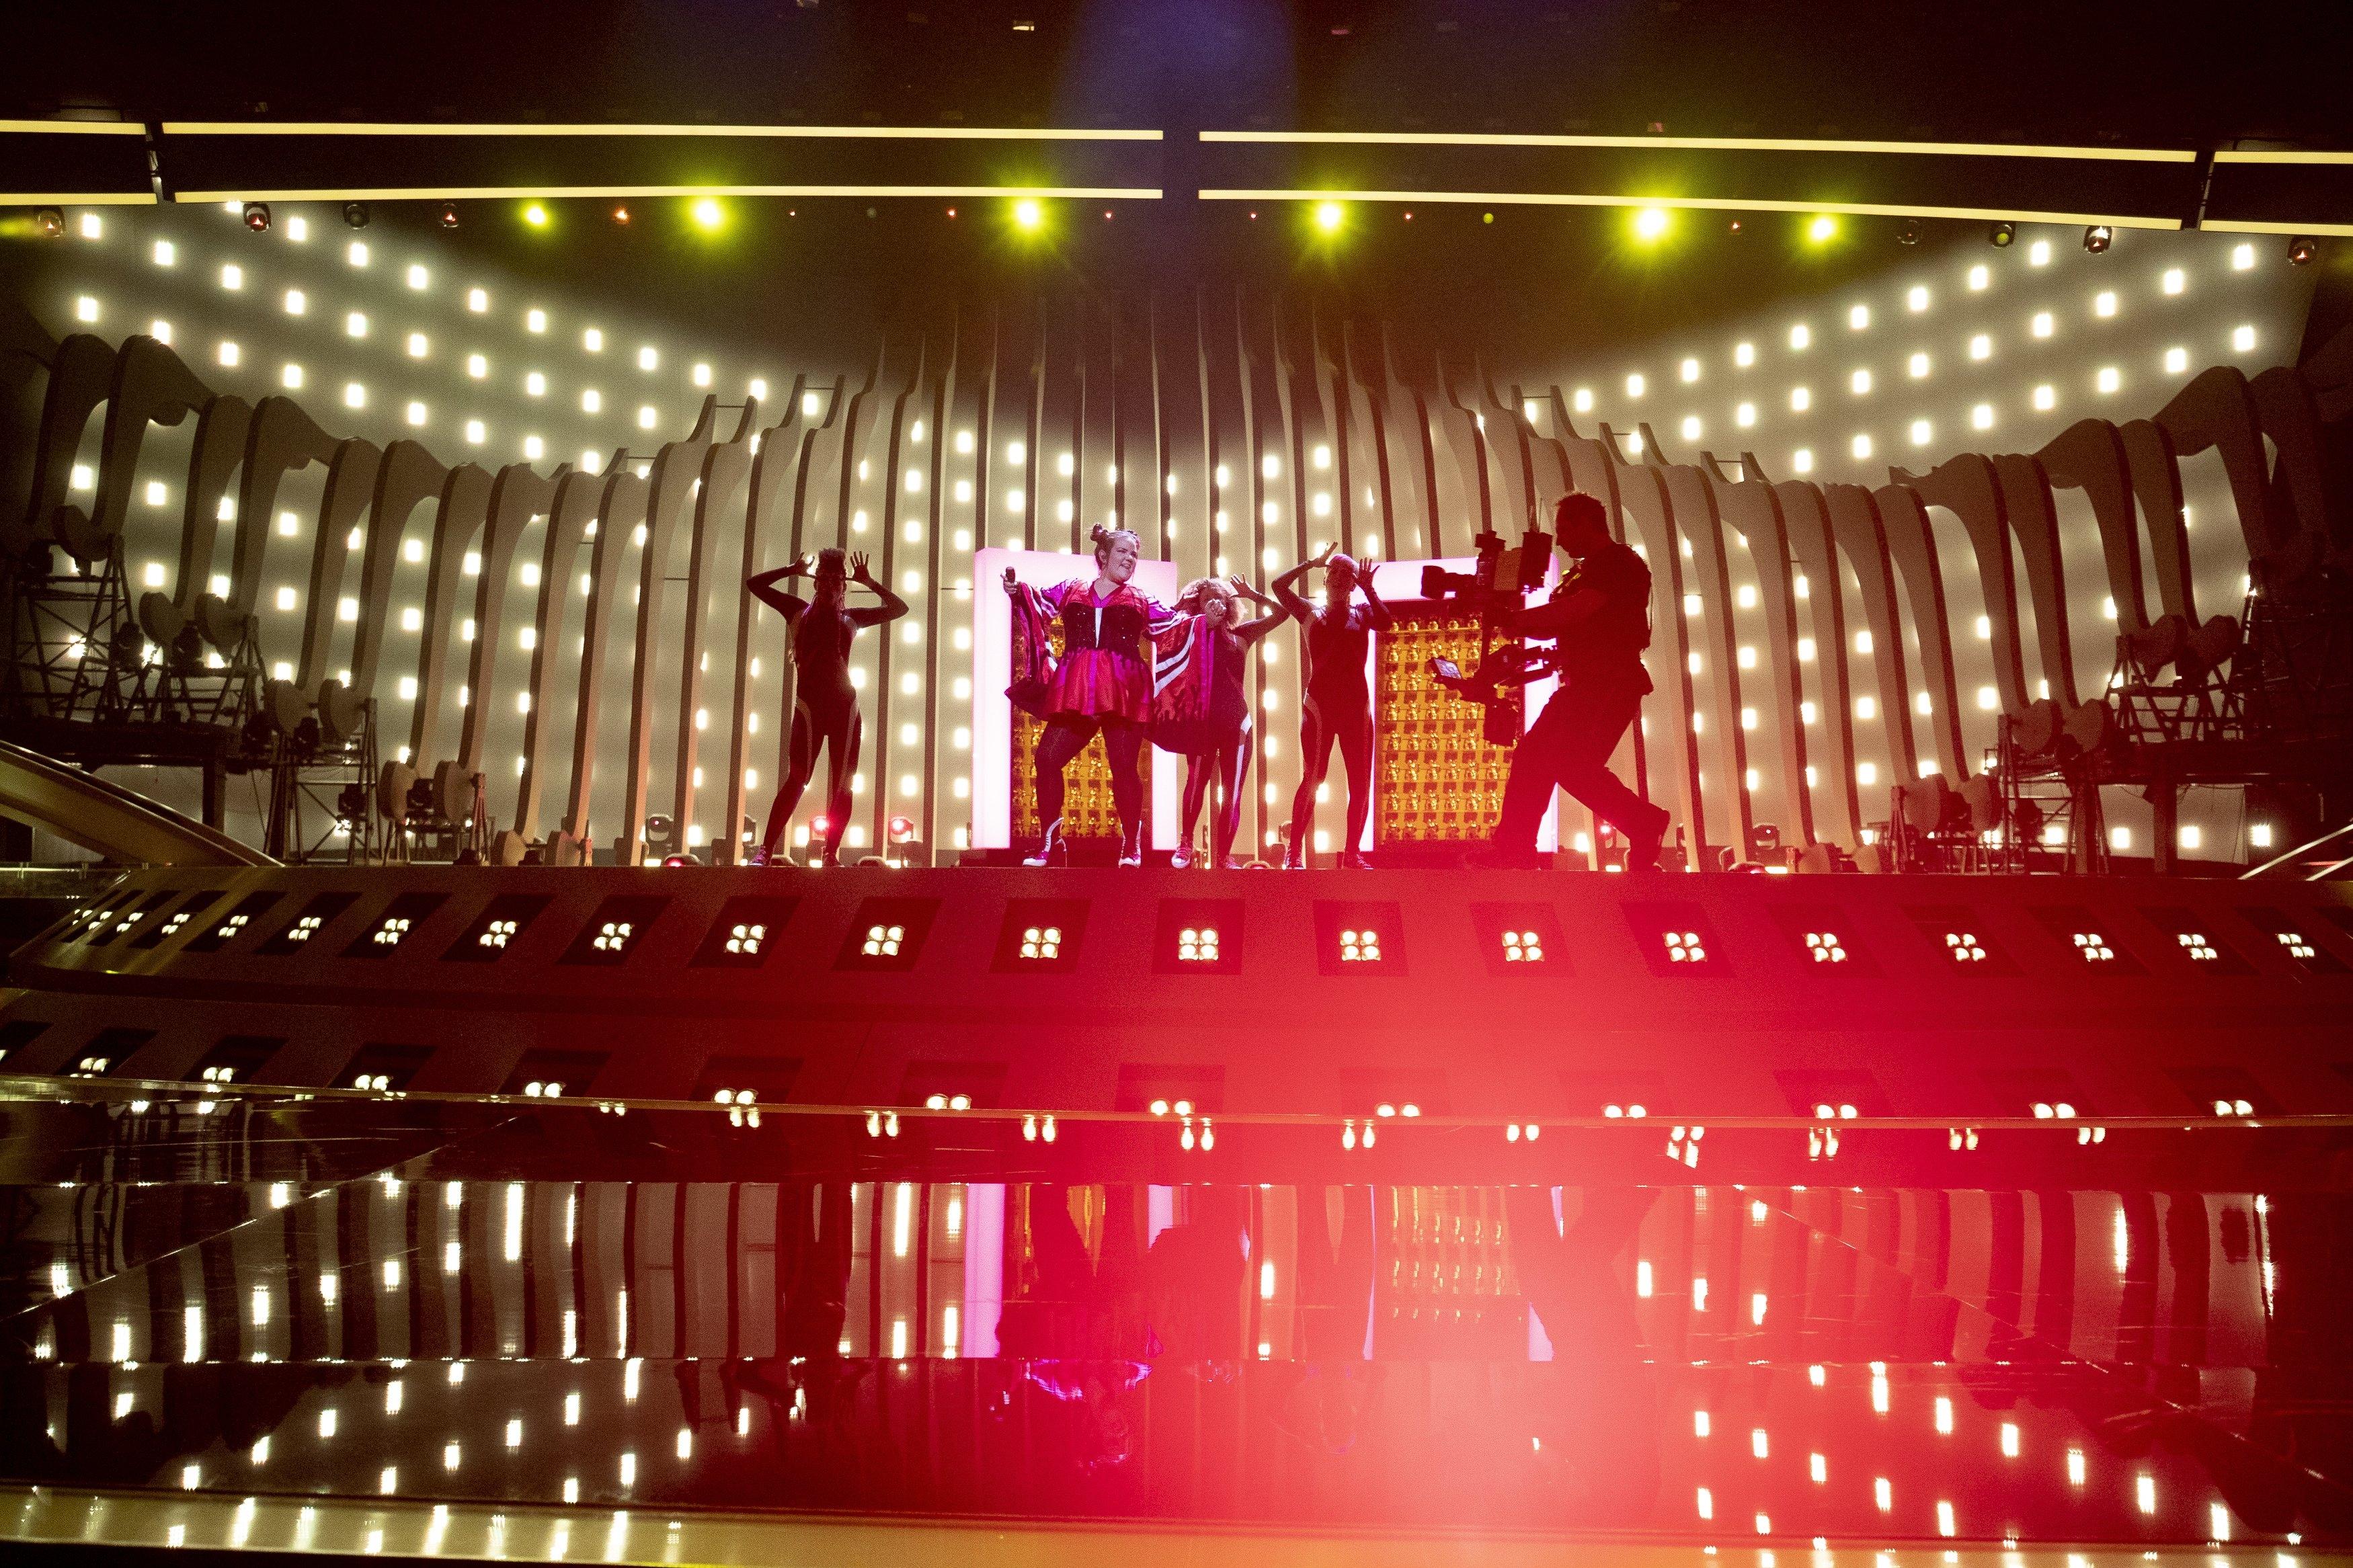 Eurovision Calendar Of Events: 2019 – Eurovoix Maroon 5 Calendar 2019